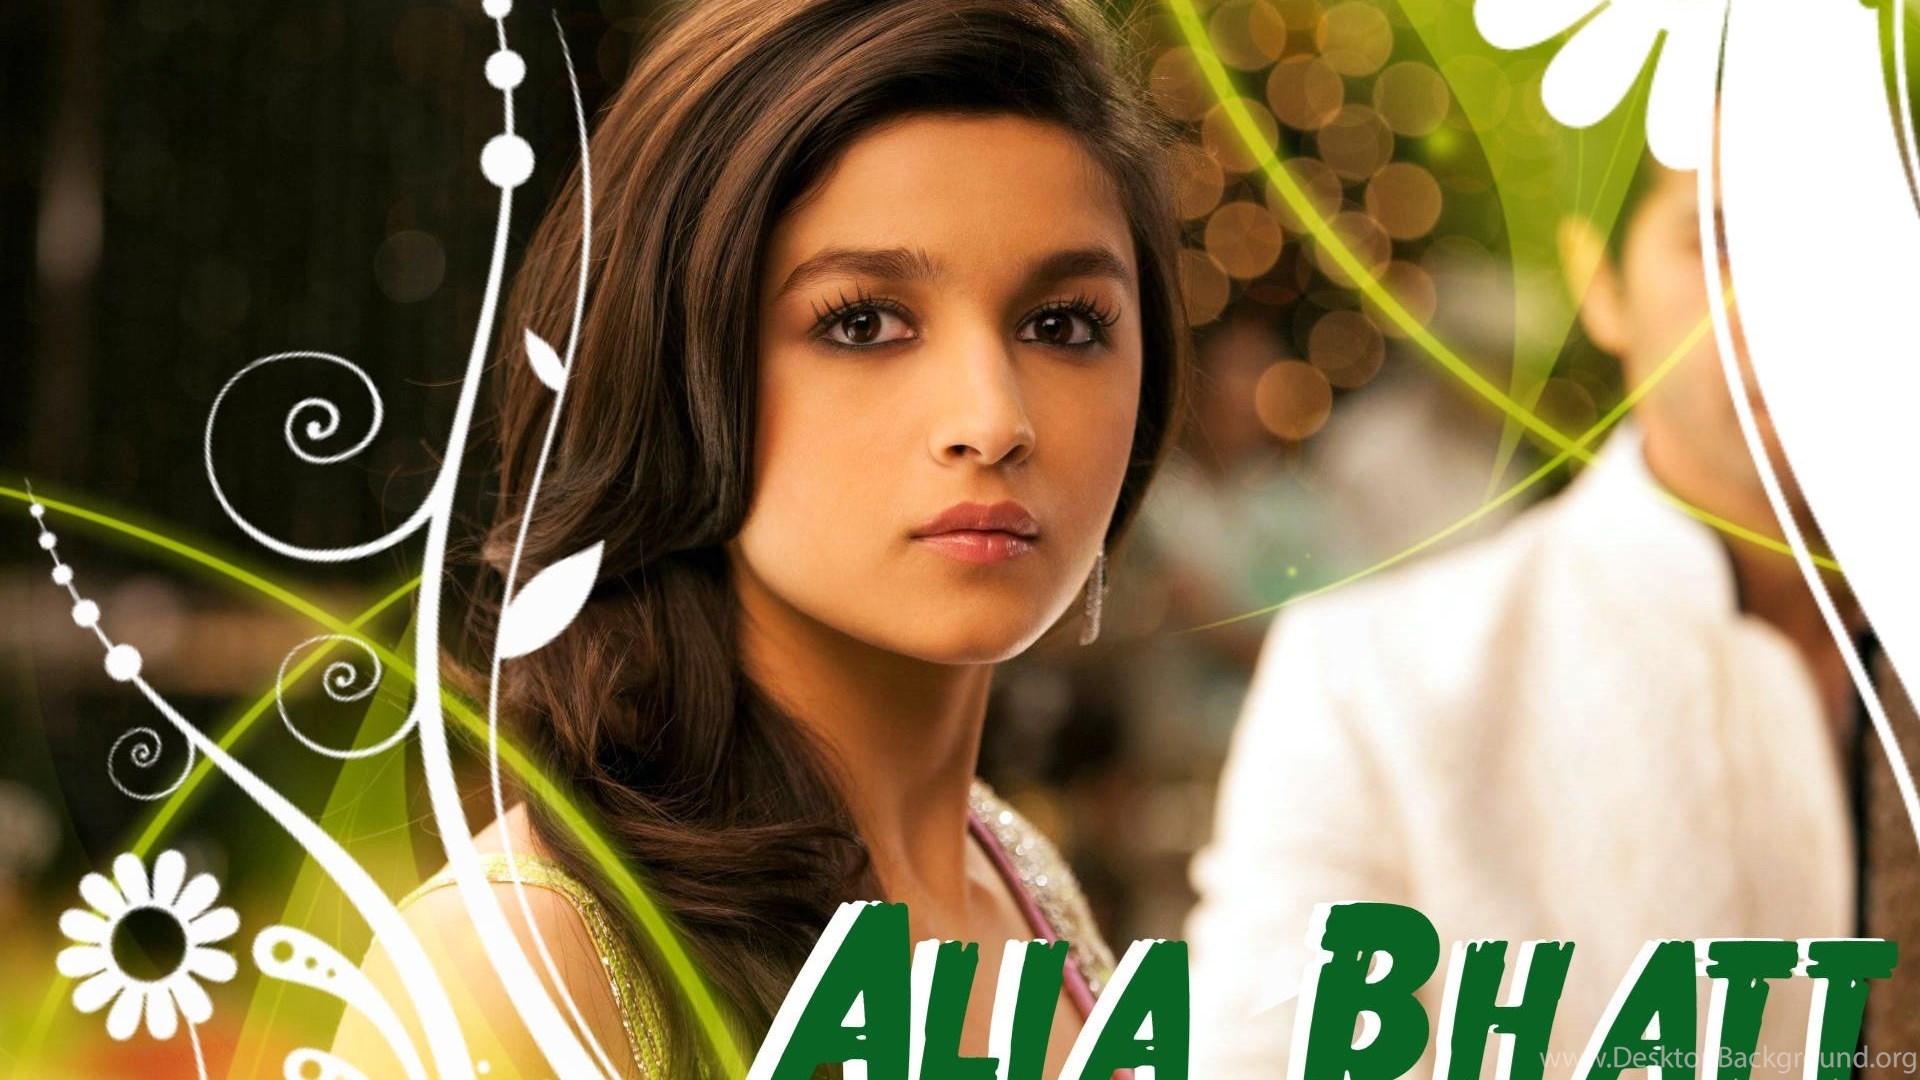 Bollywood Actress Alia Bhatt Sleeveless Hd Wallpapers Desktop Background